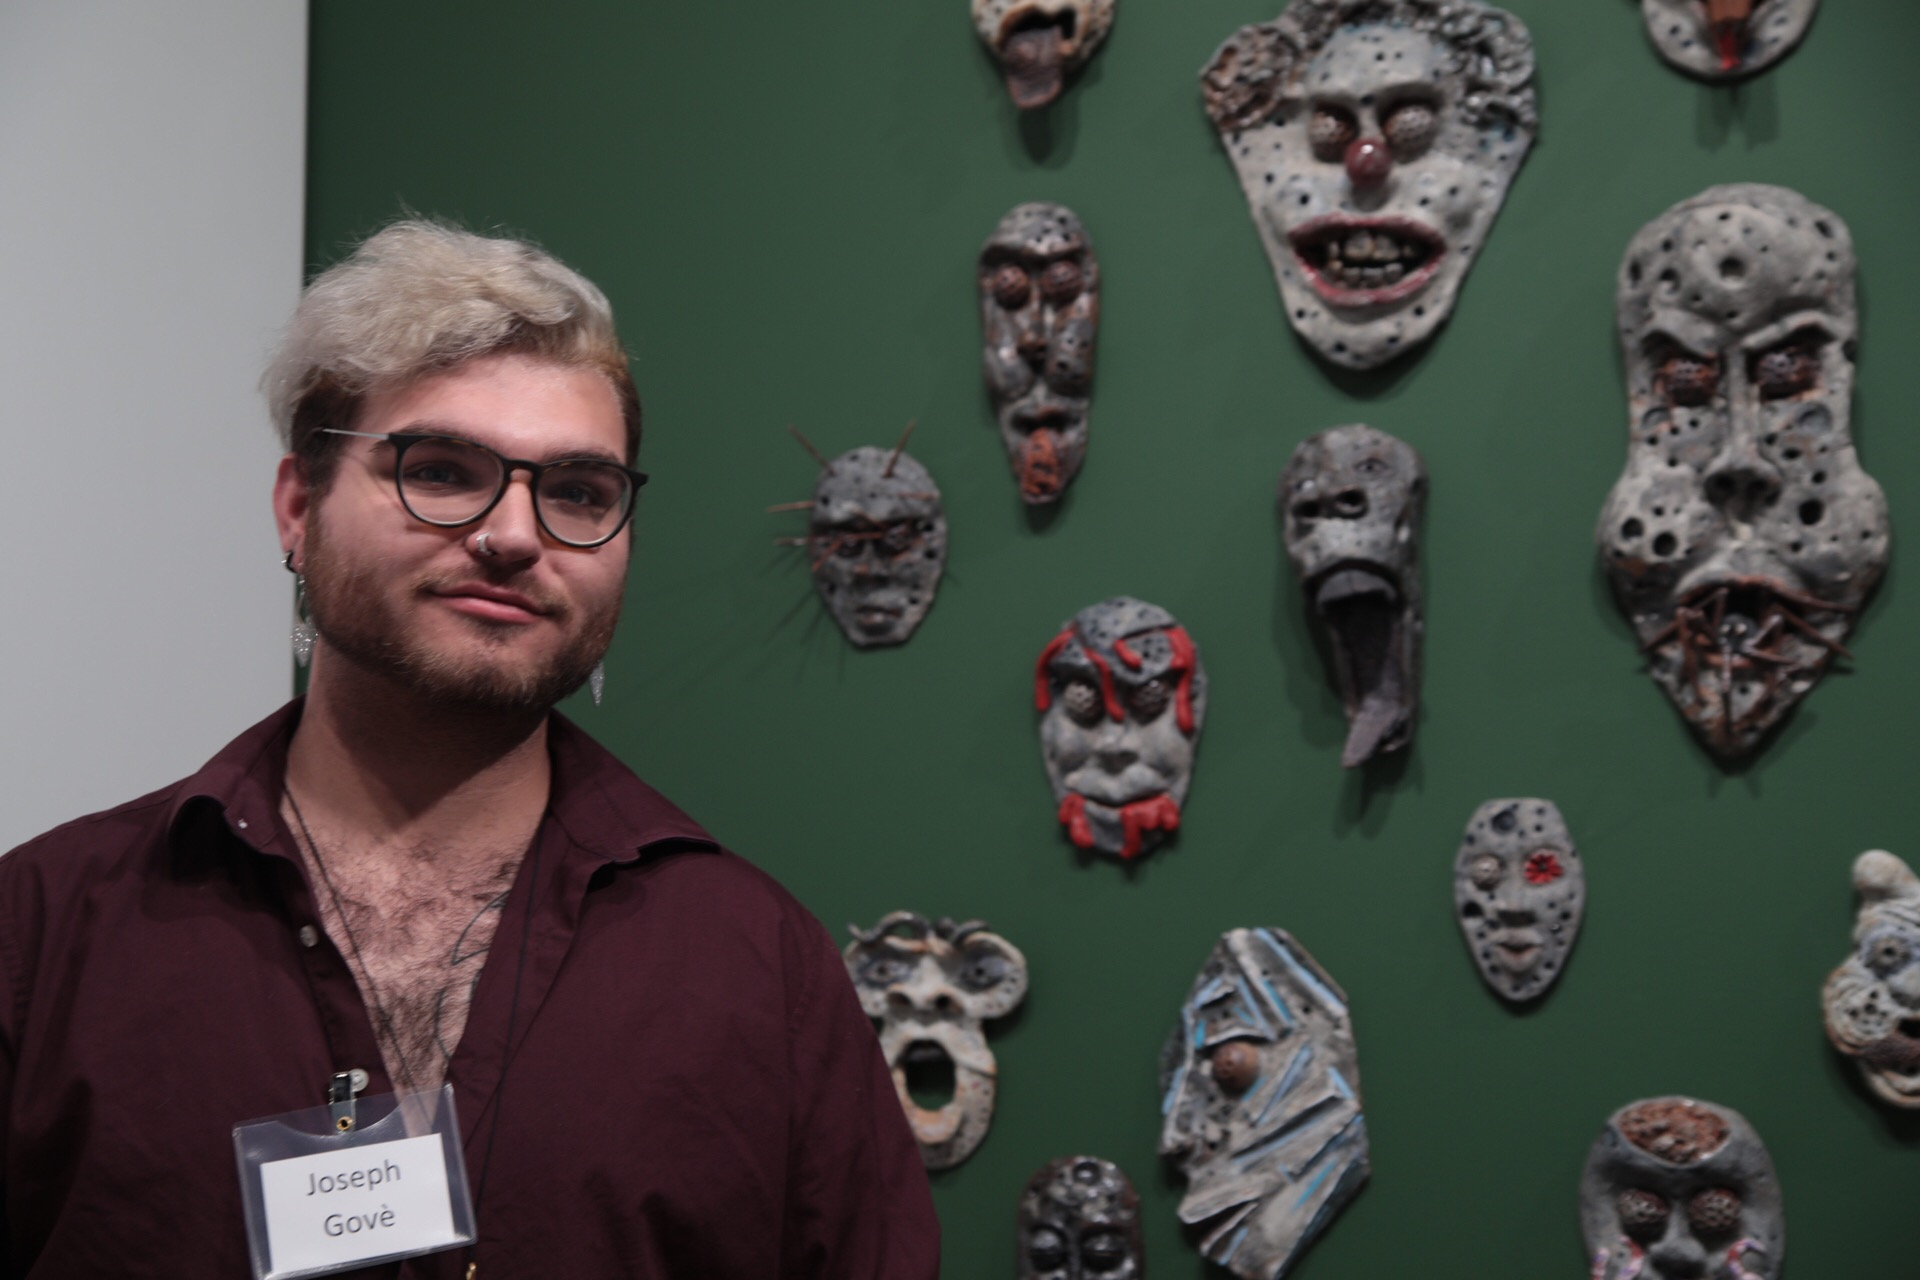 Joseph Govè with Phobia Masks.